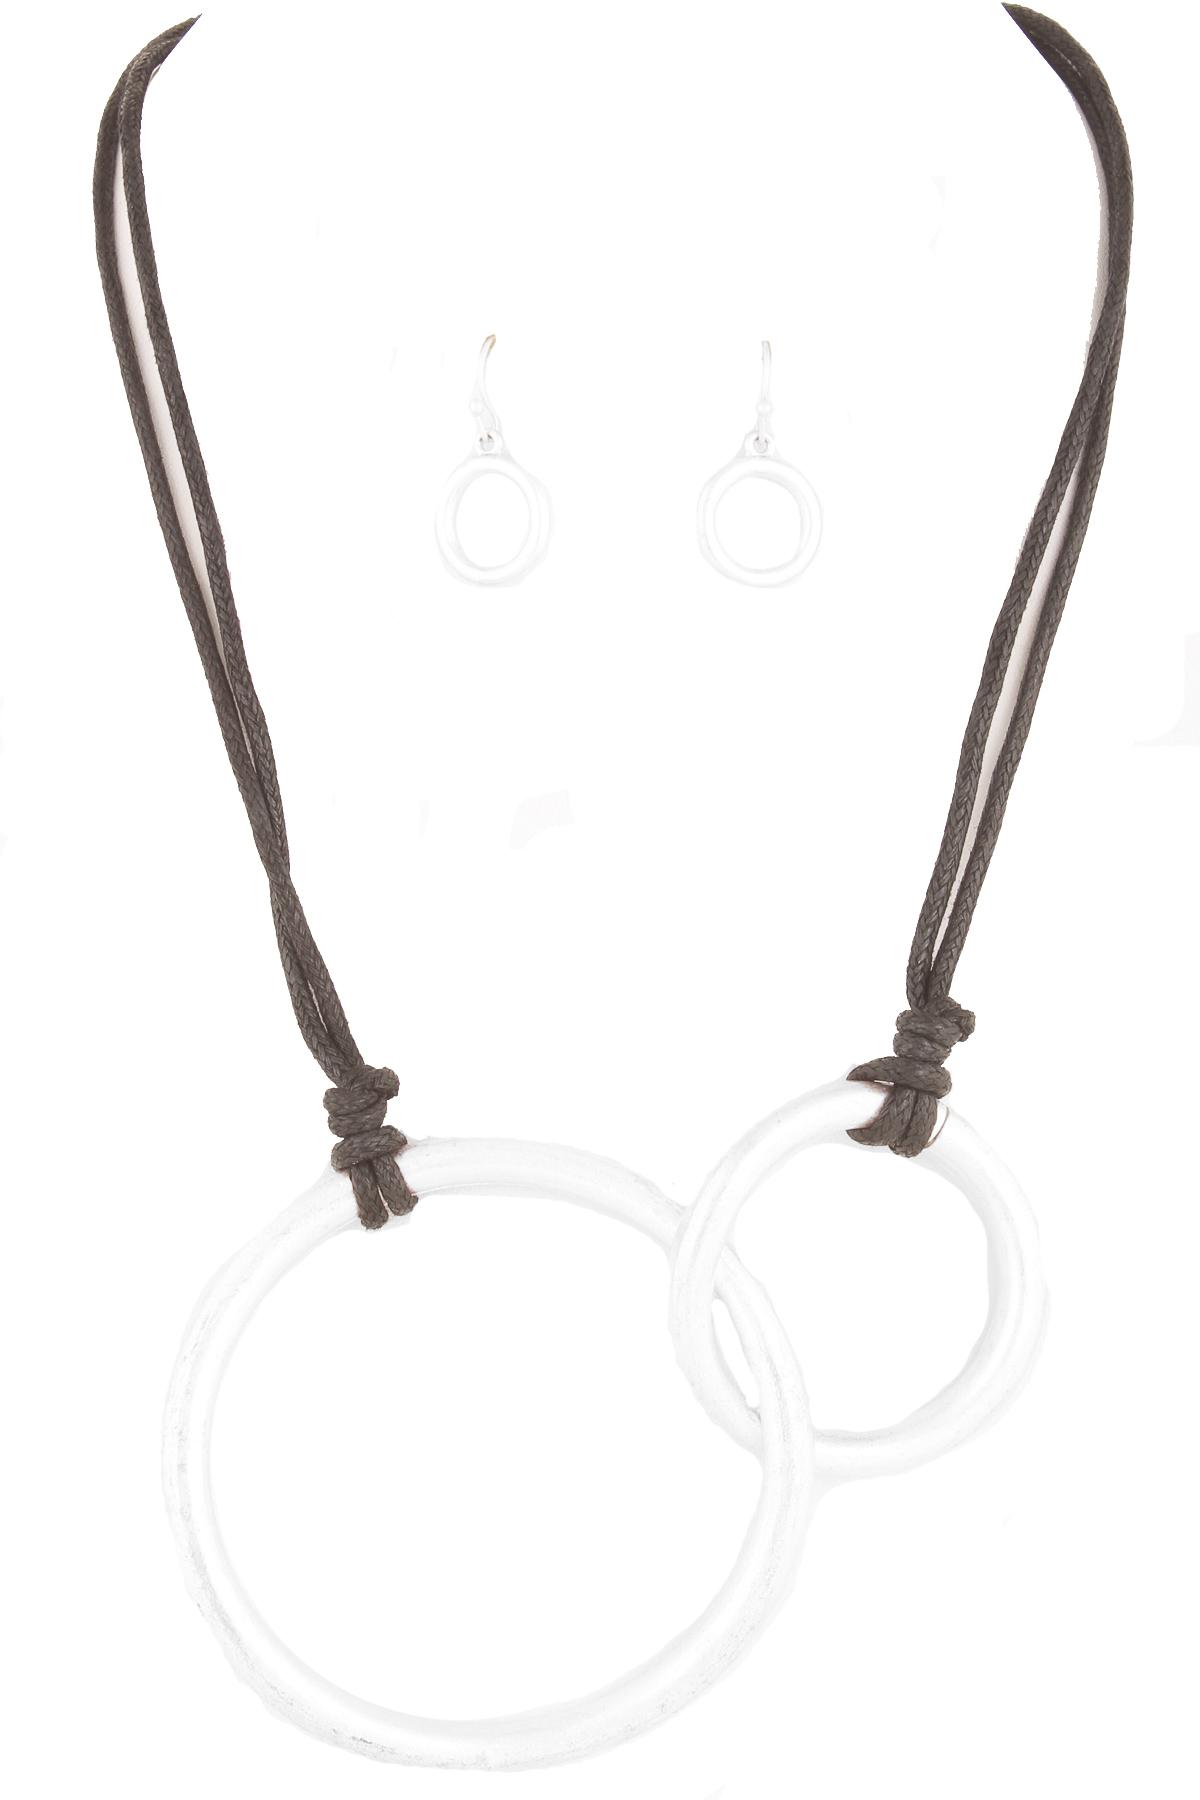 Linked Circle Cutout Wax Cord Necklace Set